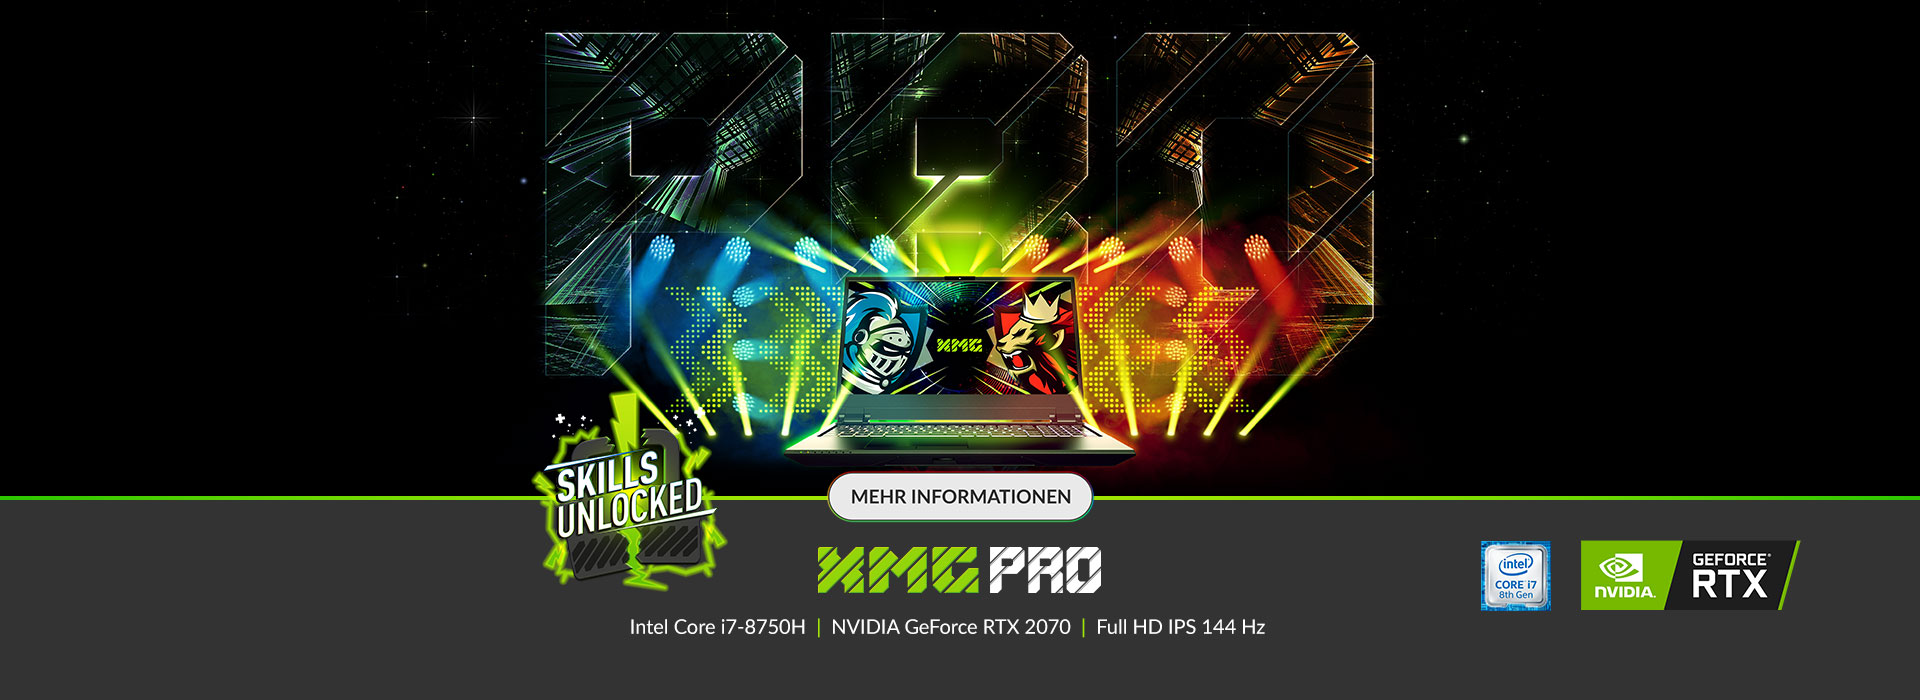 XMG PRO Serie